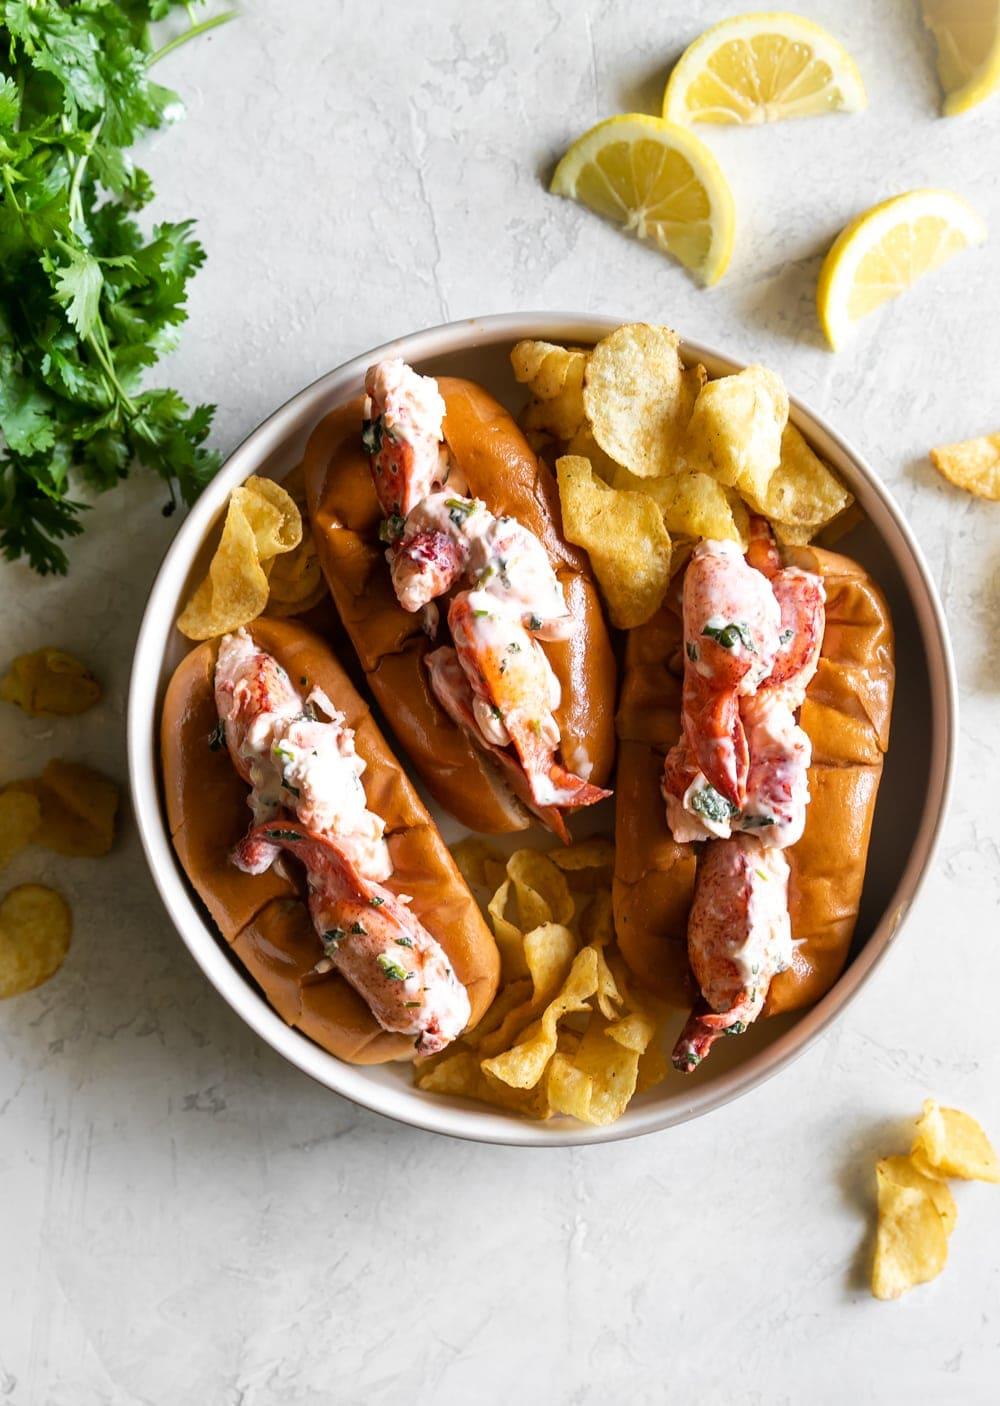 Easy Lobster Roll Recipe - A Sassy Spoon